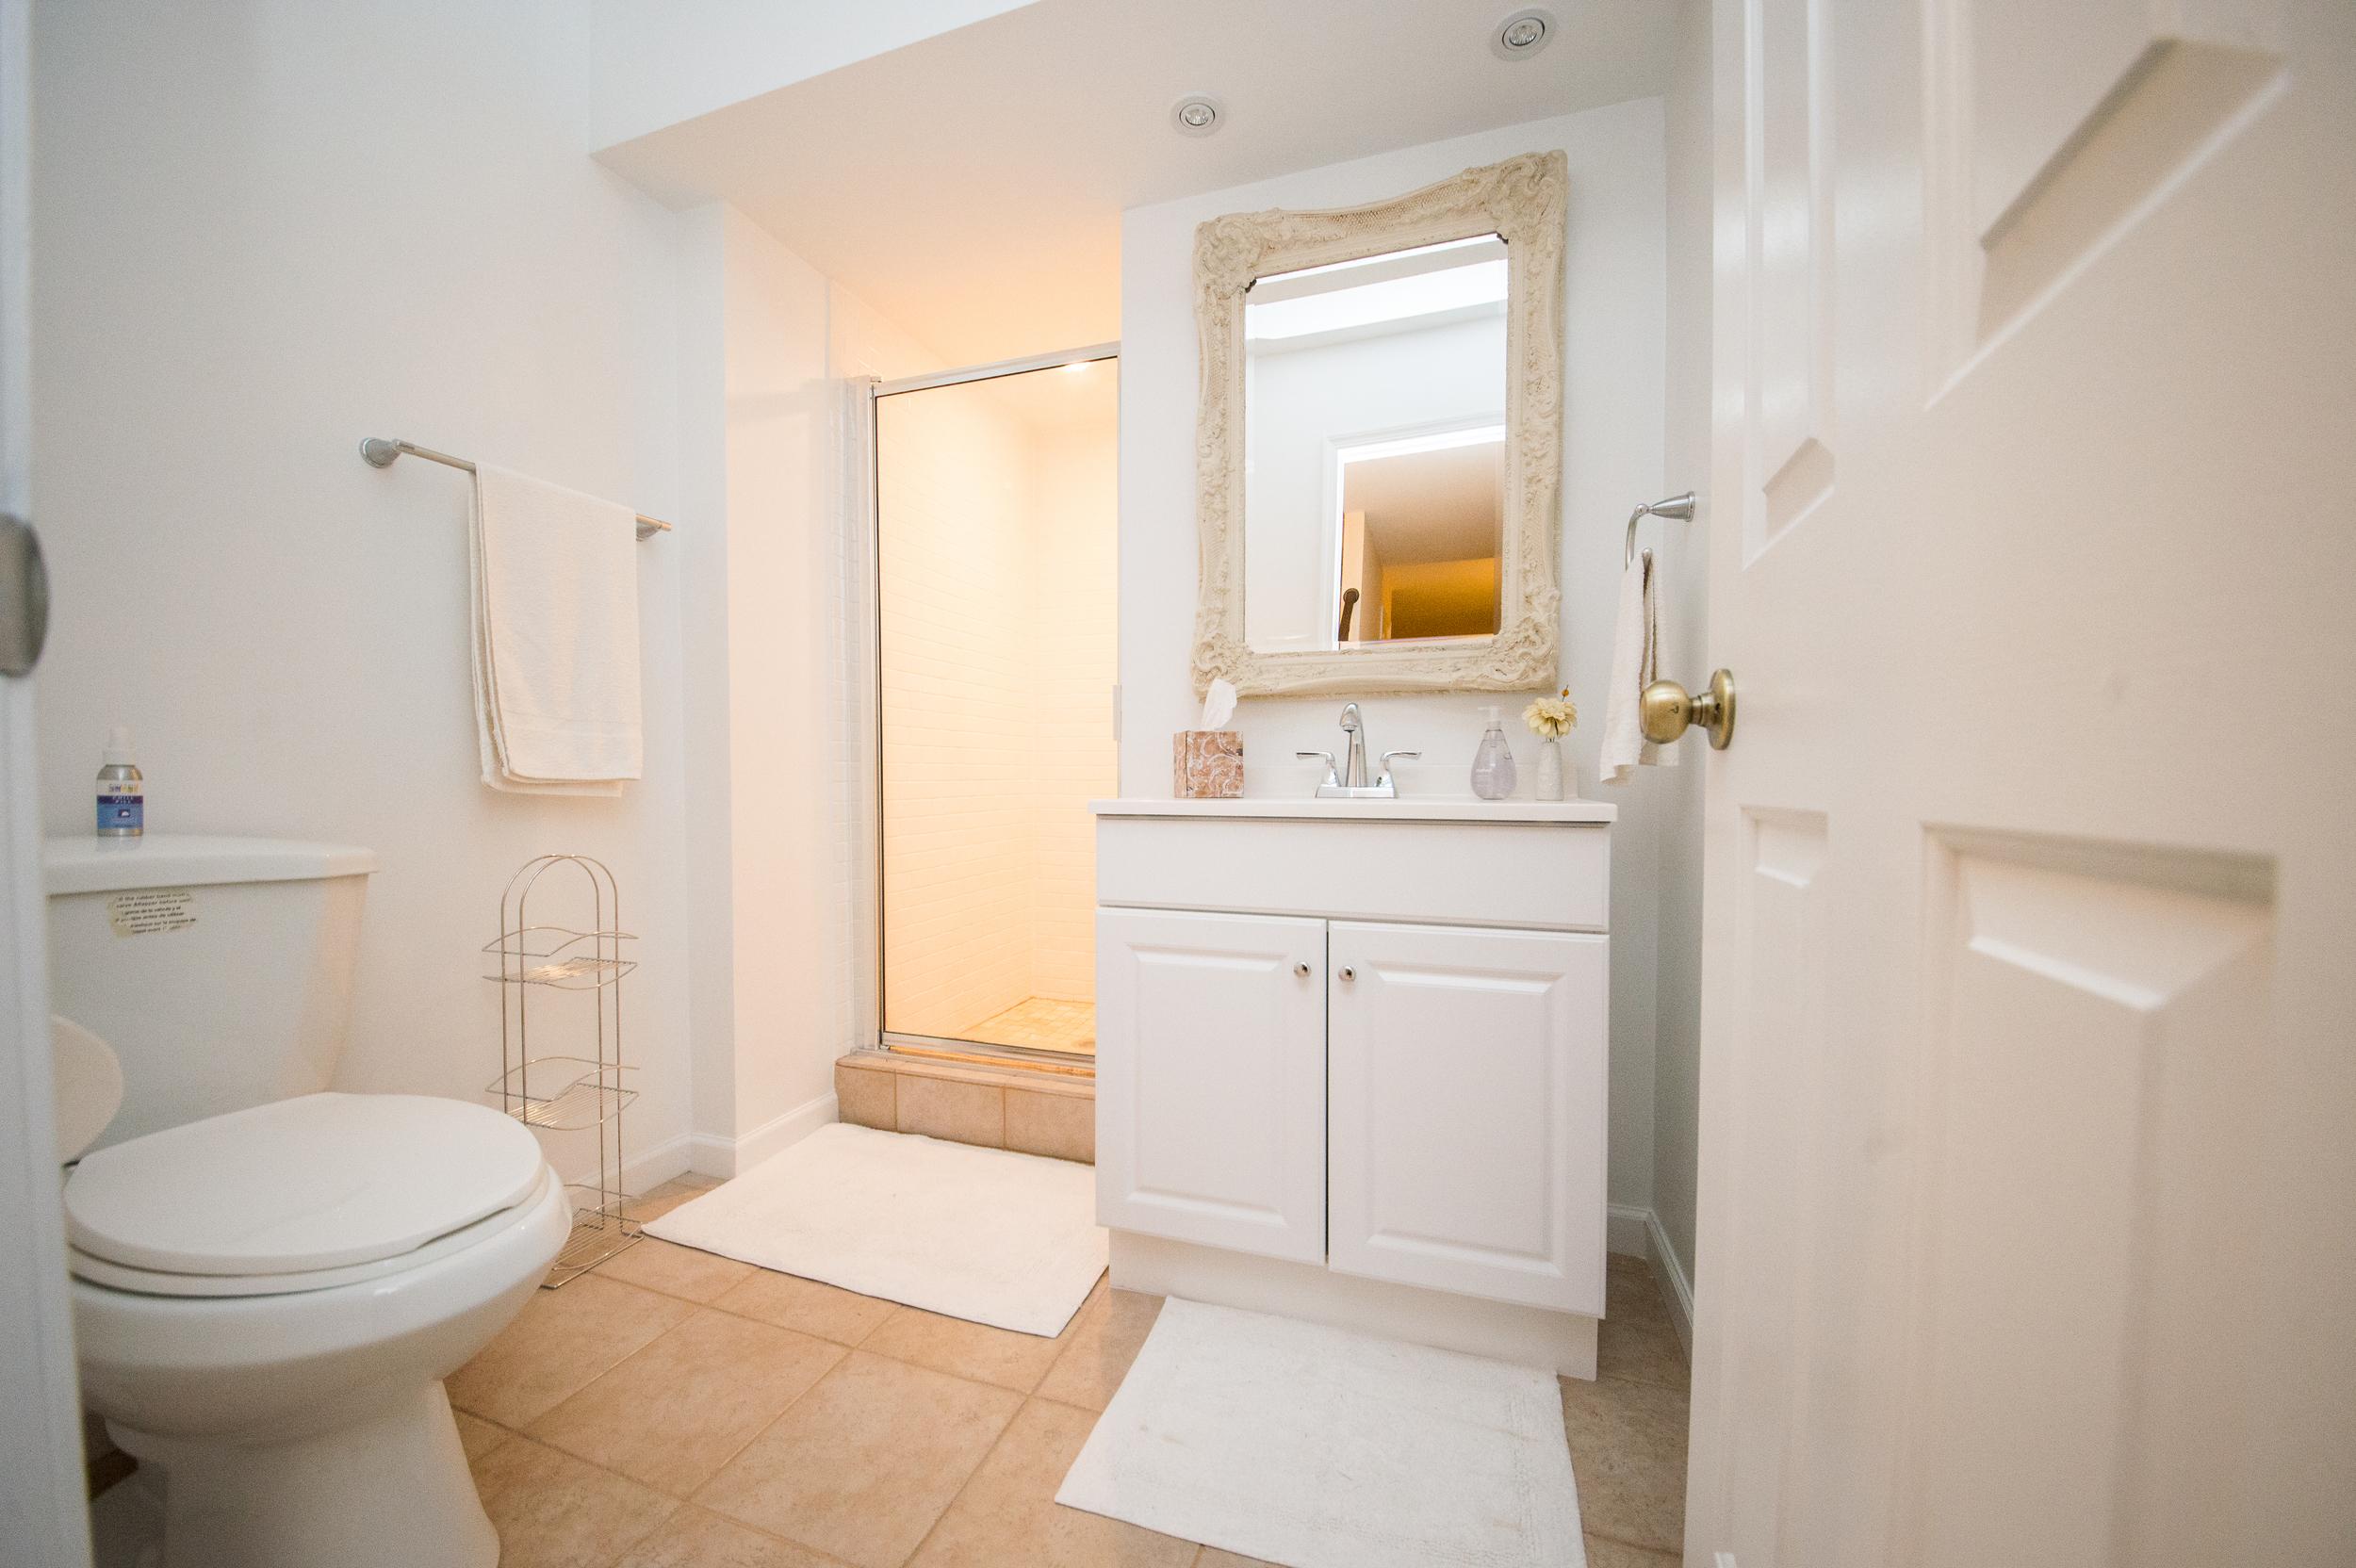 Bathroom Remodeling Reston, VA